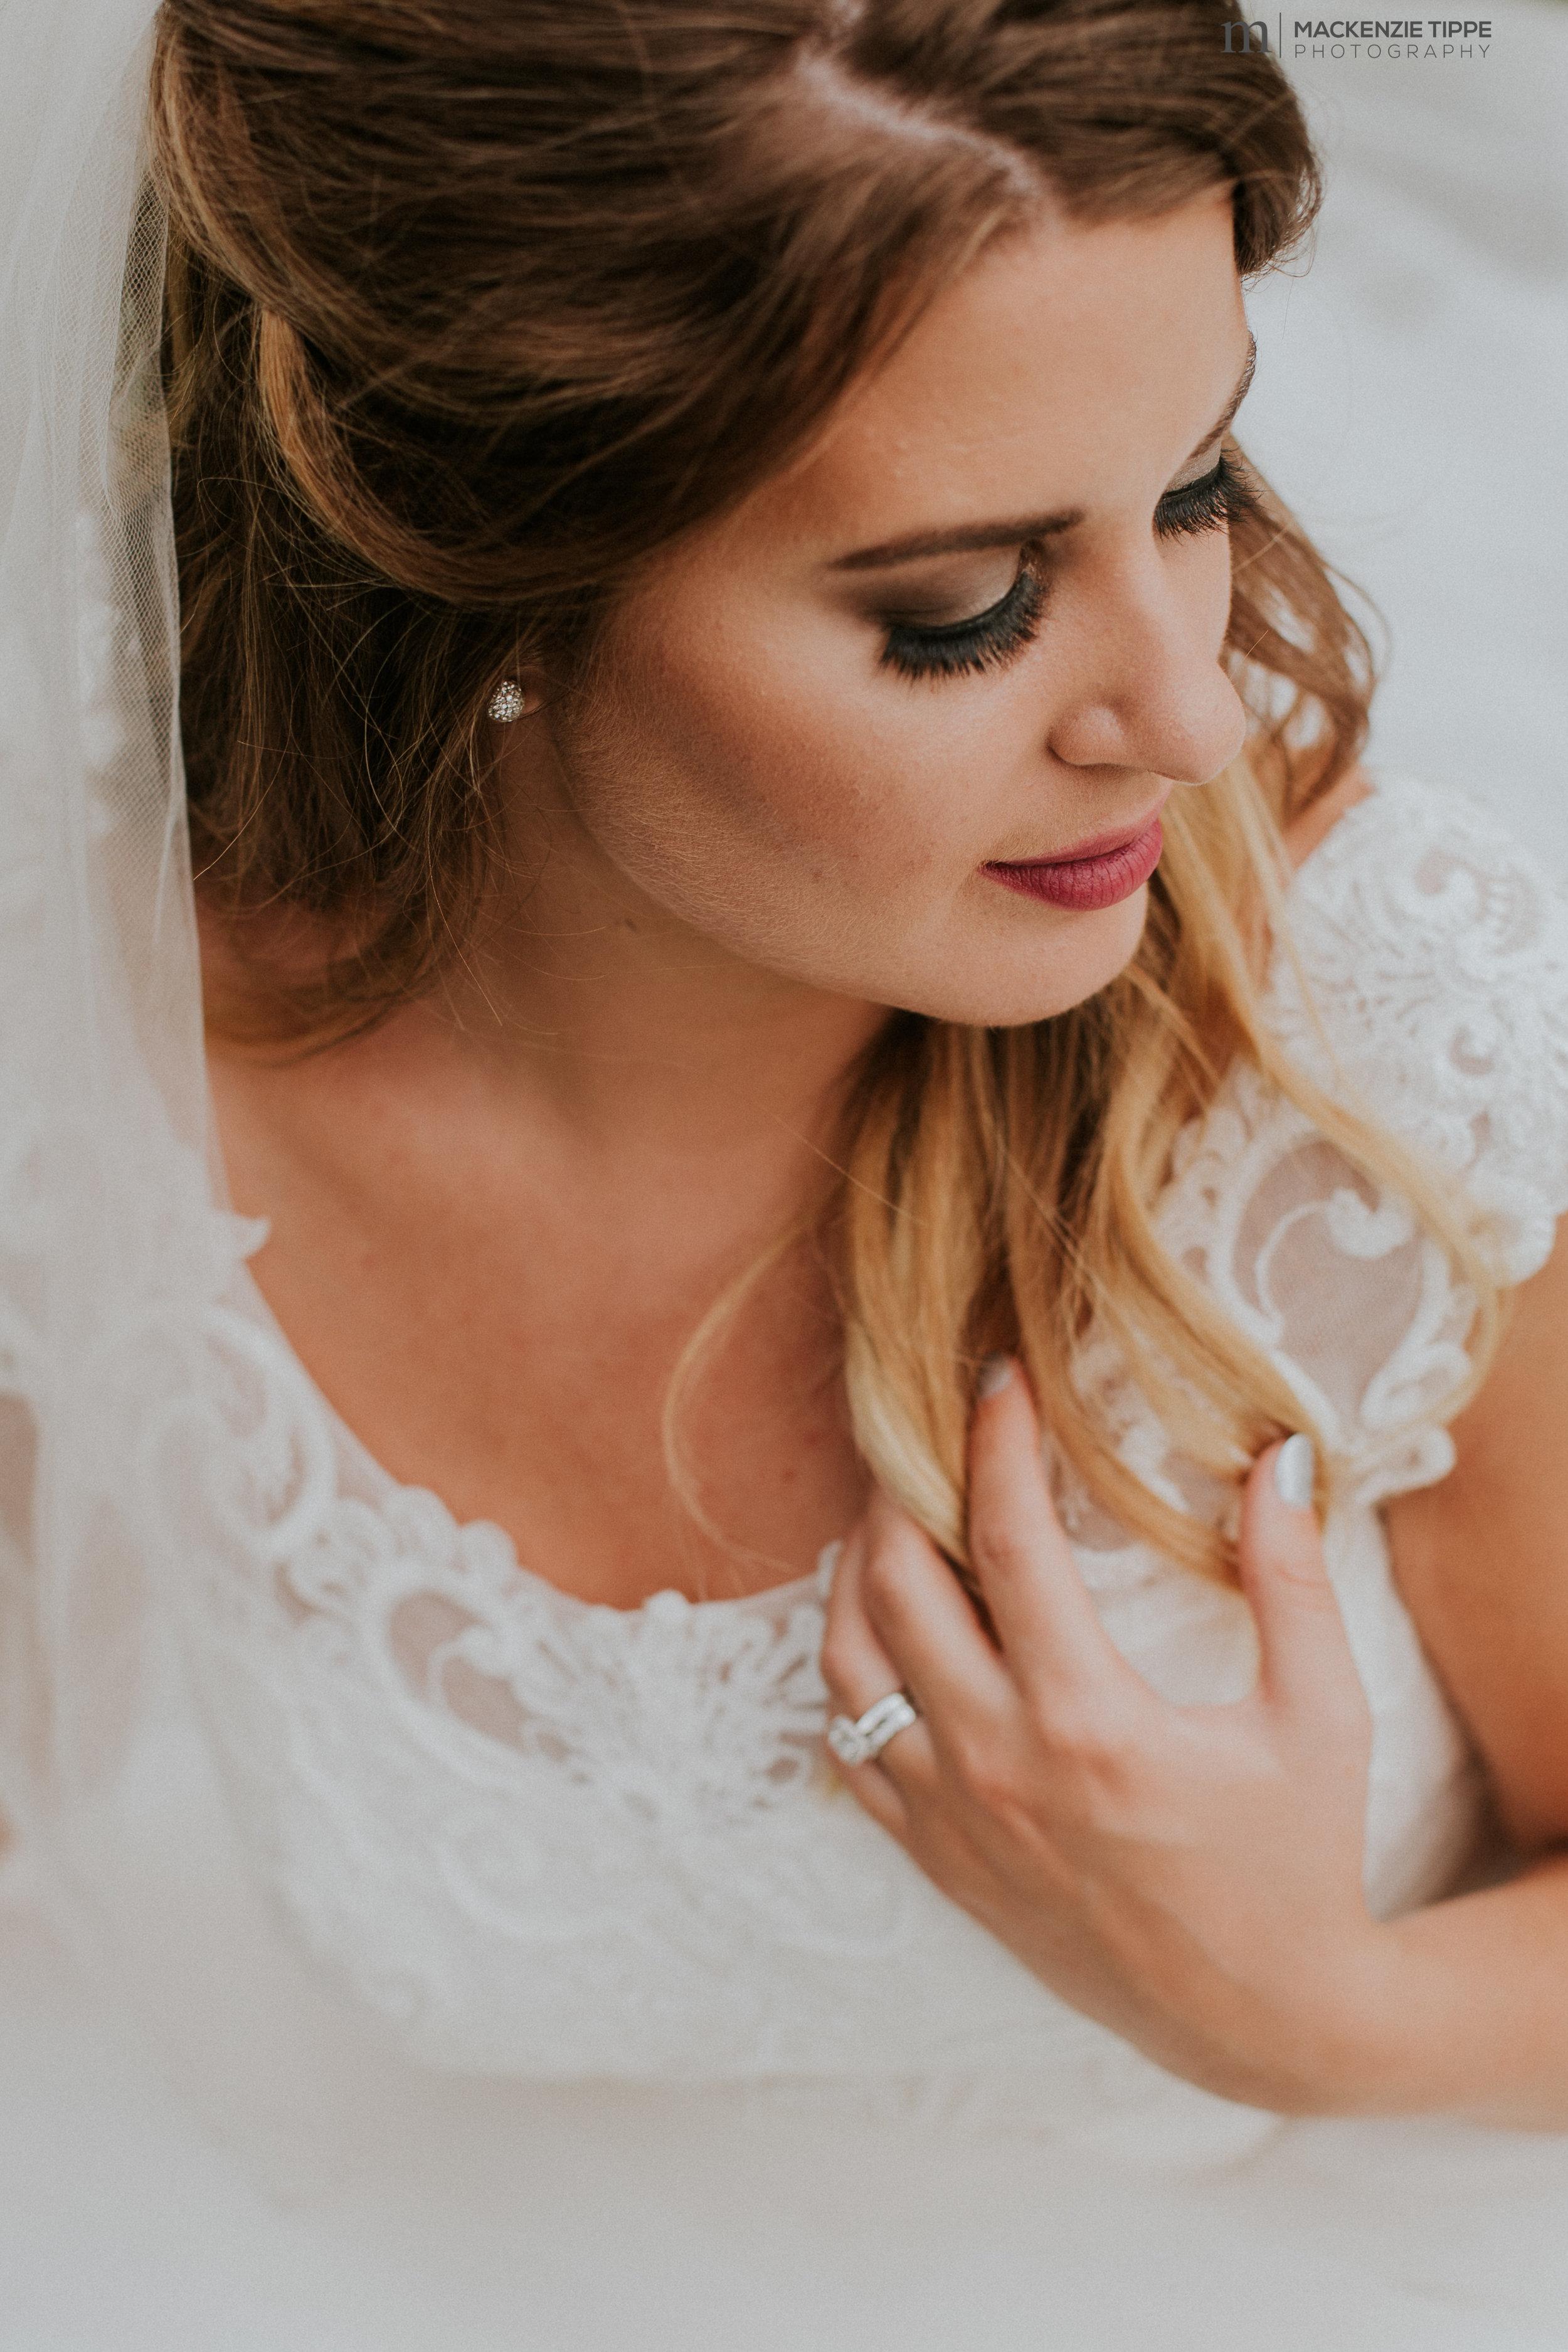 Bride: Jana  Photo: Mackenzie Tippe Photography